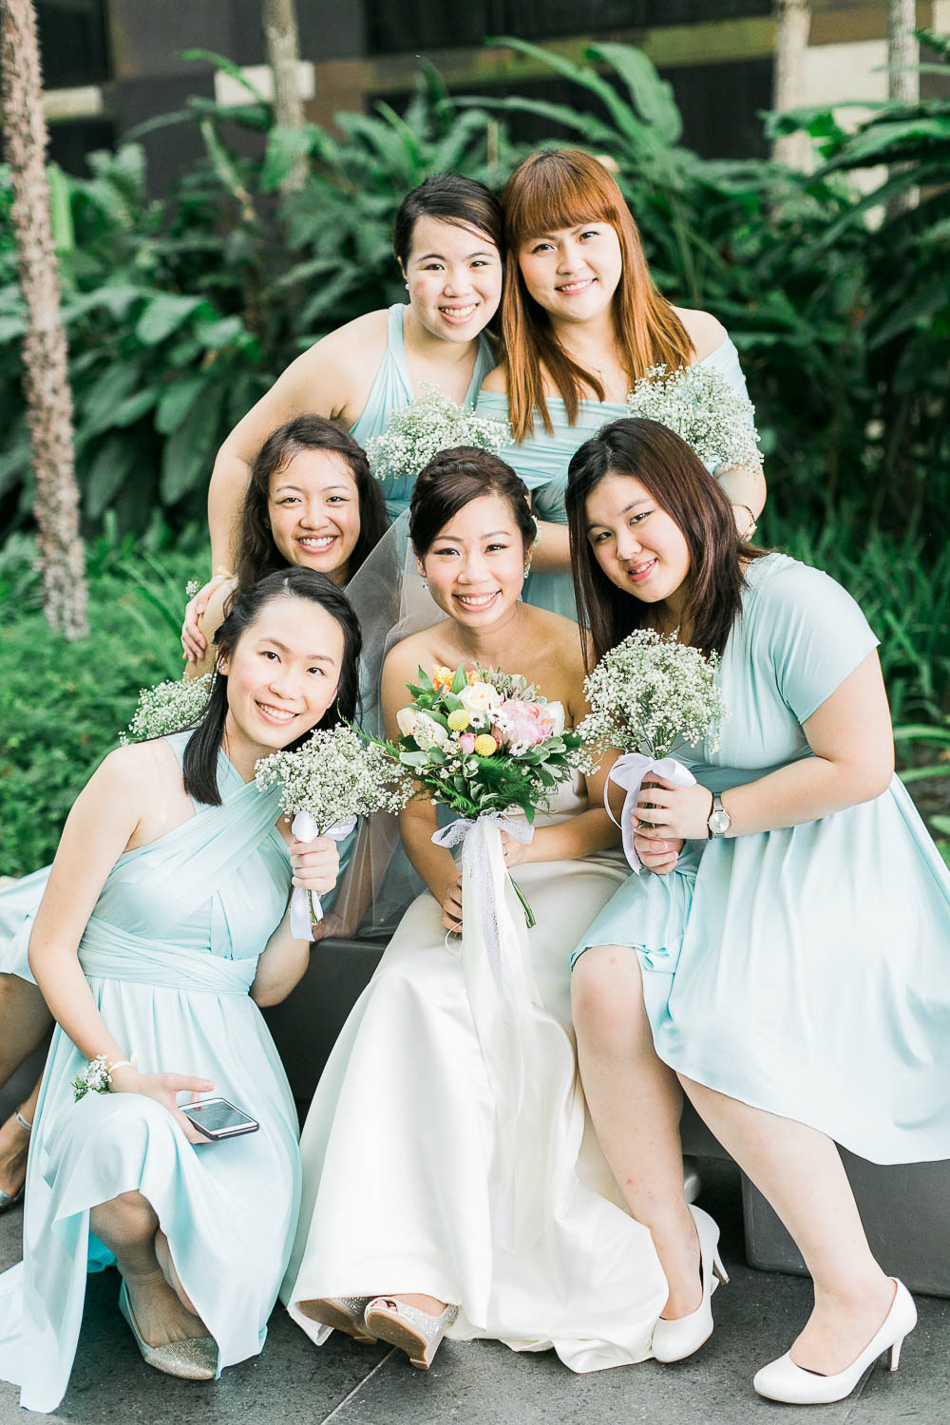 wedding-photographer-singapore-film-photographer-chen-sands-MinKang-wedding-CSPBLOG-24.jpg